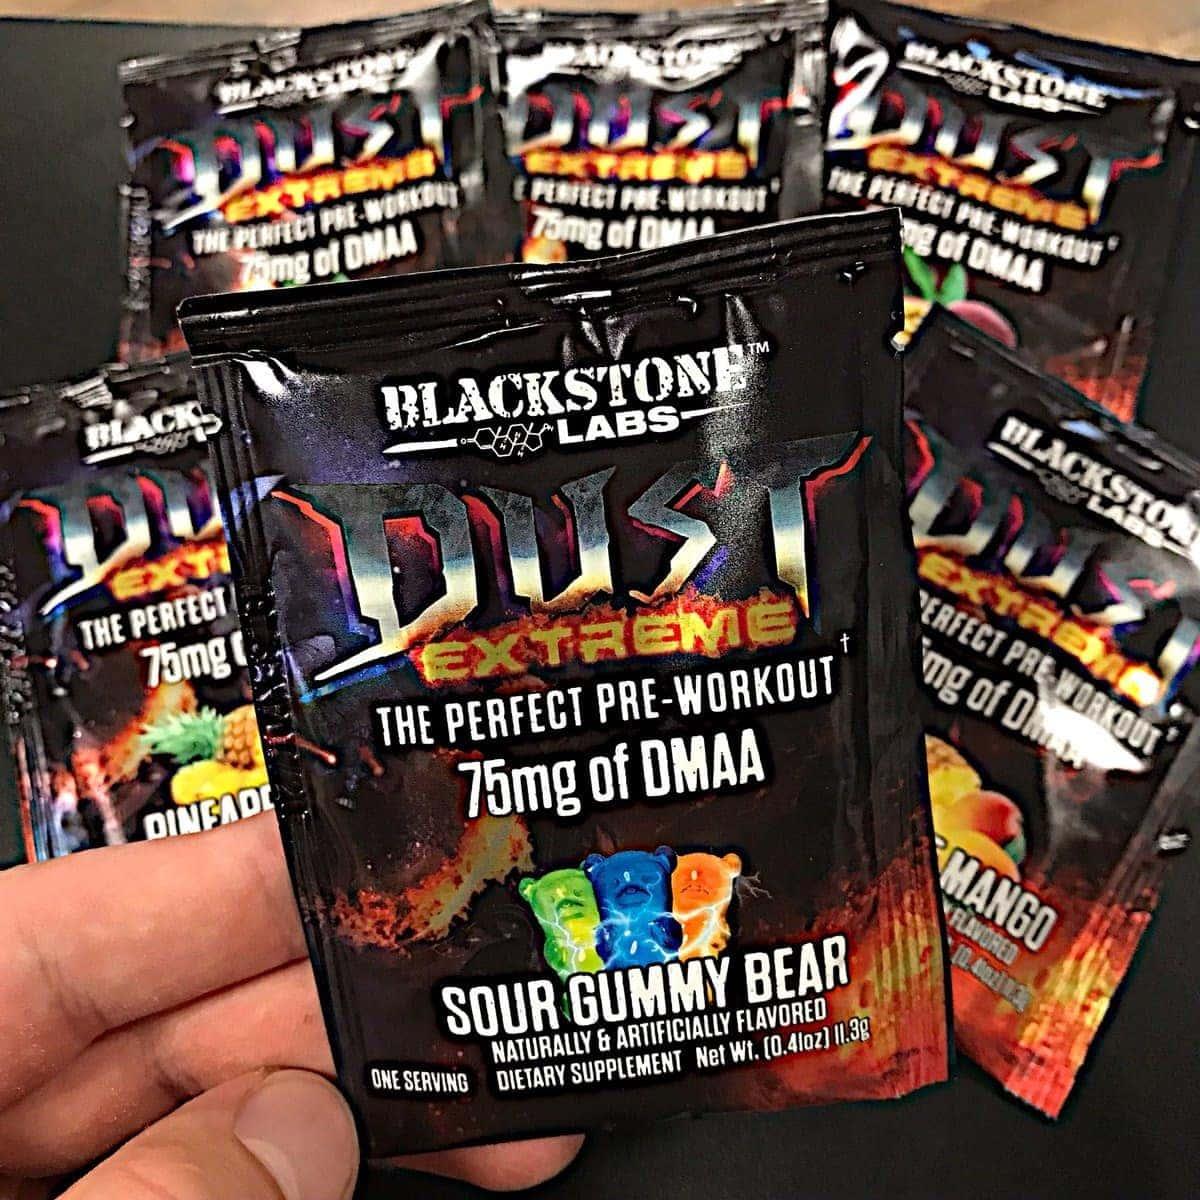 Blackstone Labs - Dust Extreme (Sample) - djjuypbx0am vkf